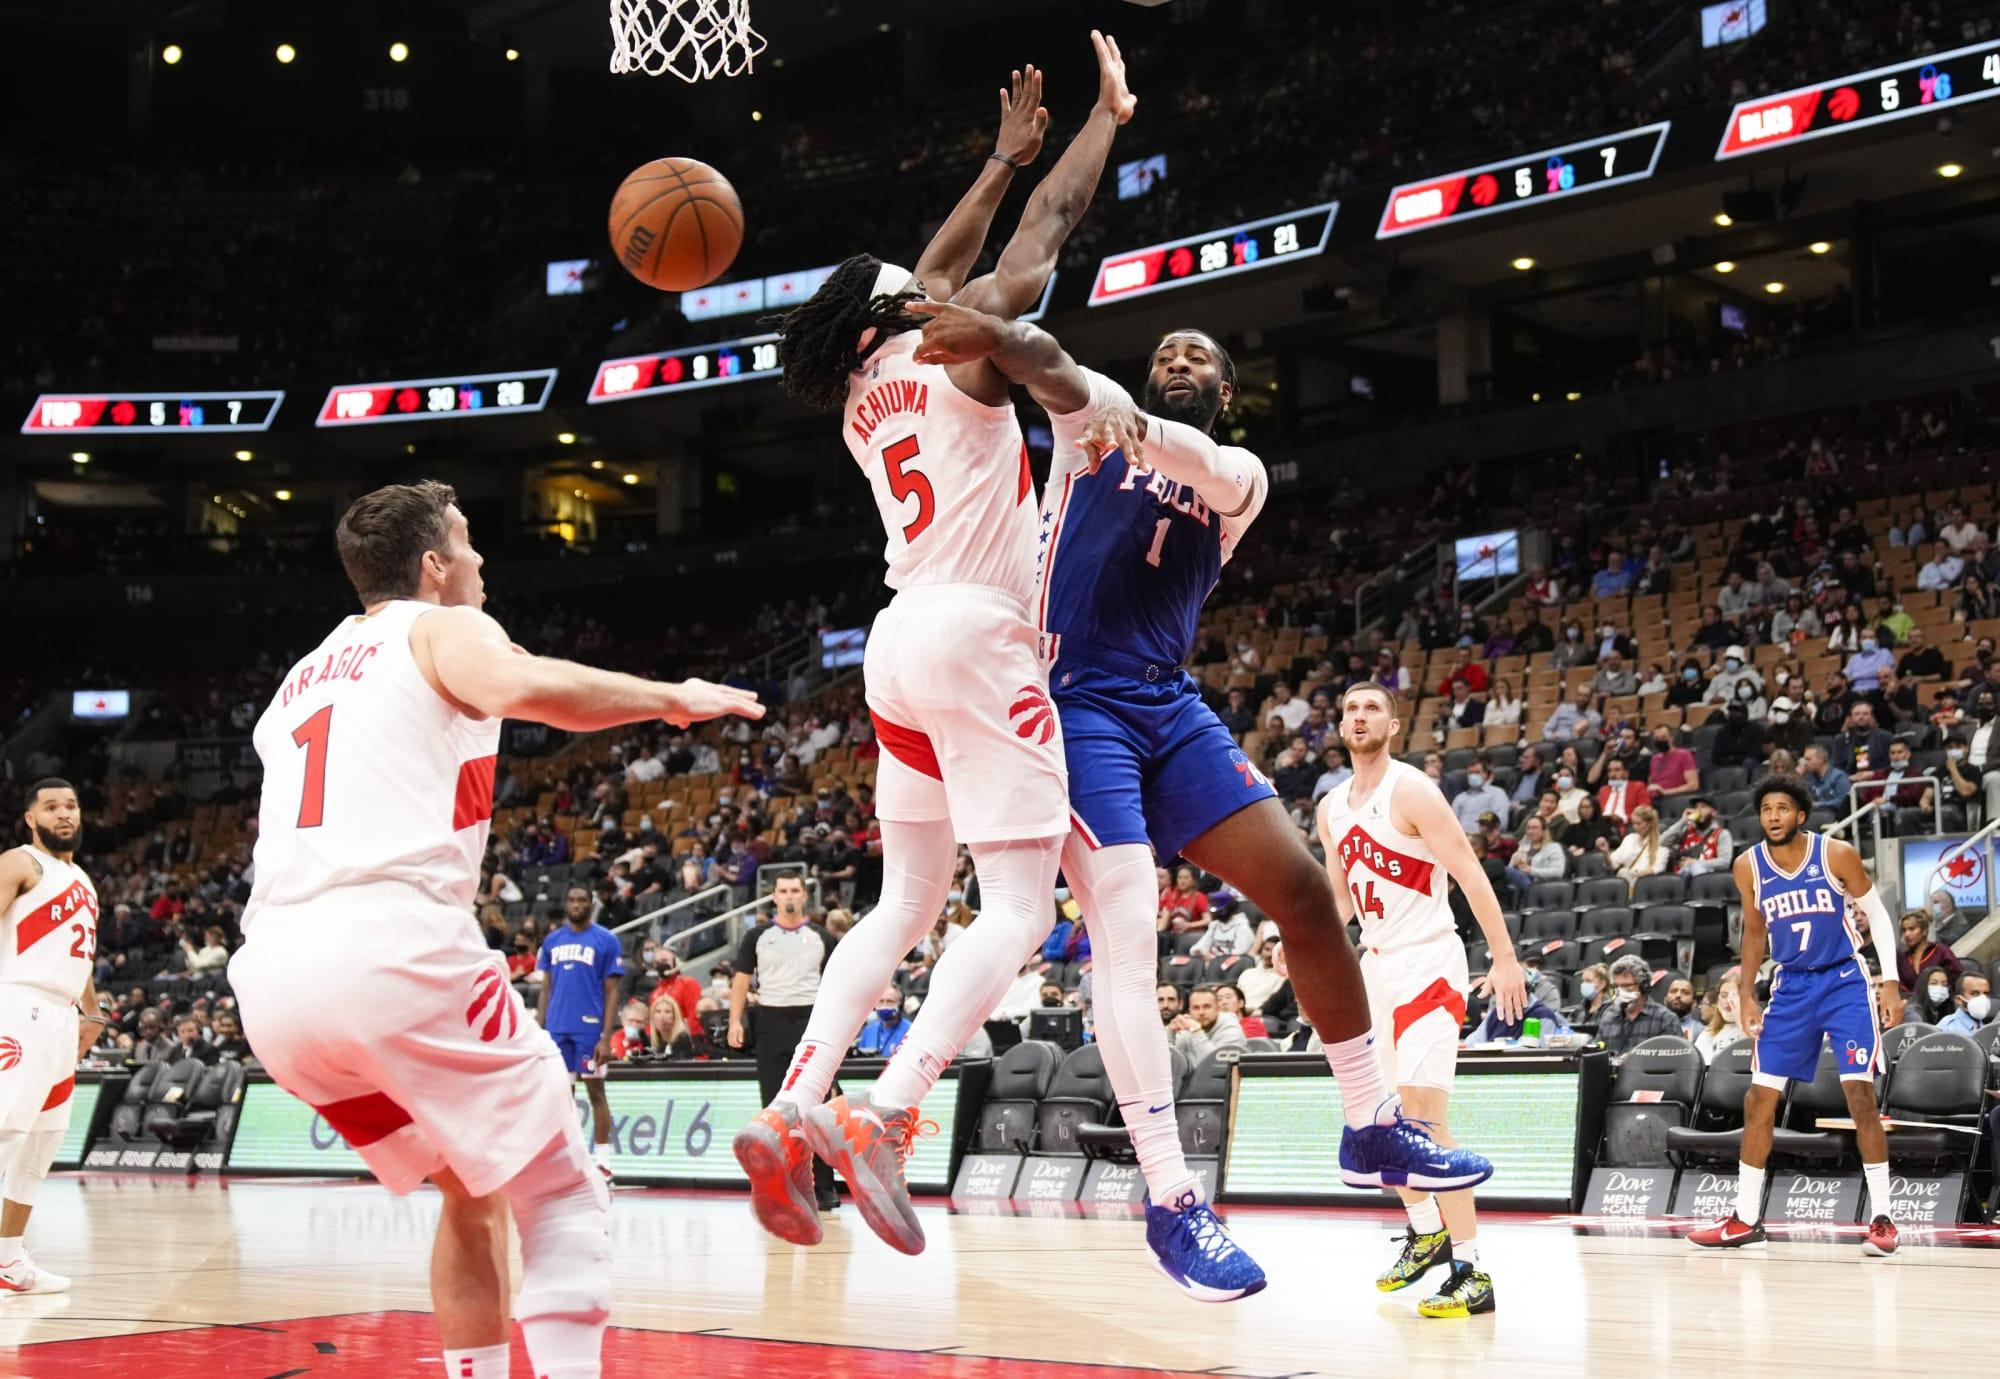 Toronto Raptors: 3 most surprising players after 3 preseason games